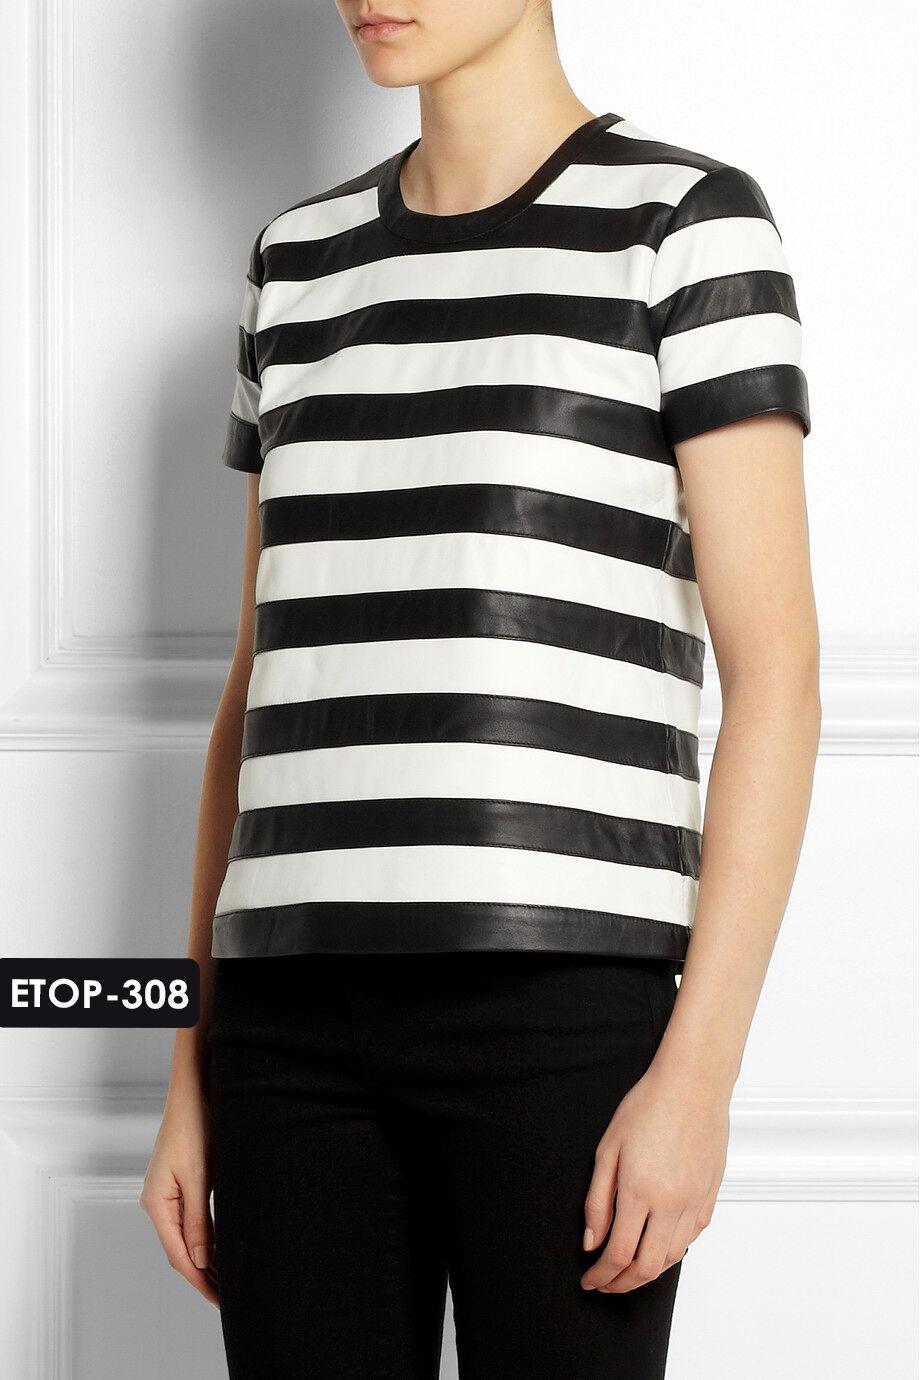 Genuine Soft Lambskin Leder Striped Top